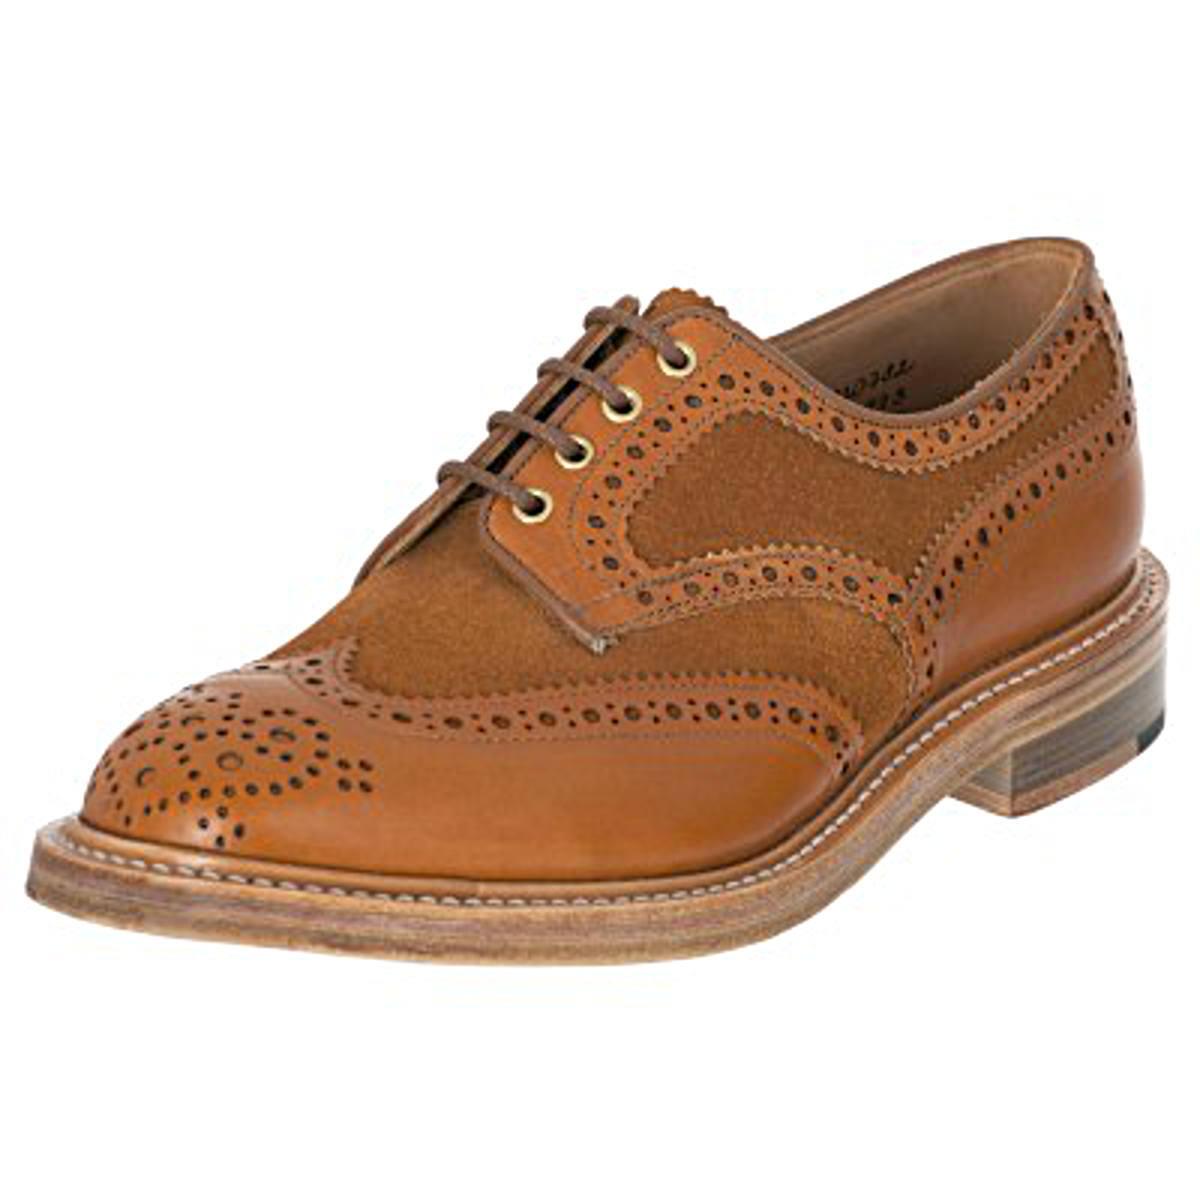 ☆【Trickers】トリッカーズ Haworth ハワース イギリス製 革靴 UKサイズ:6.5